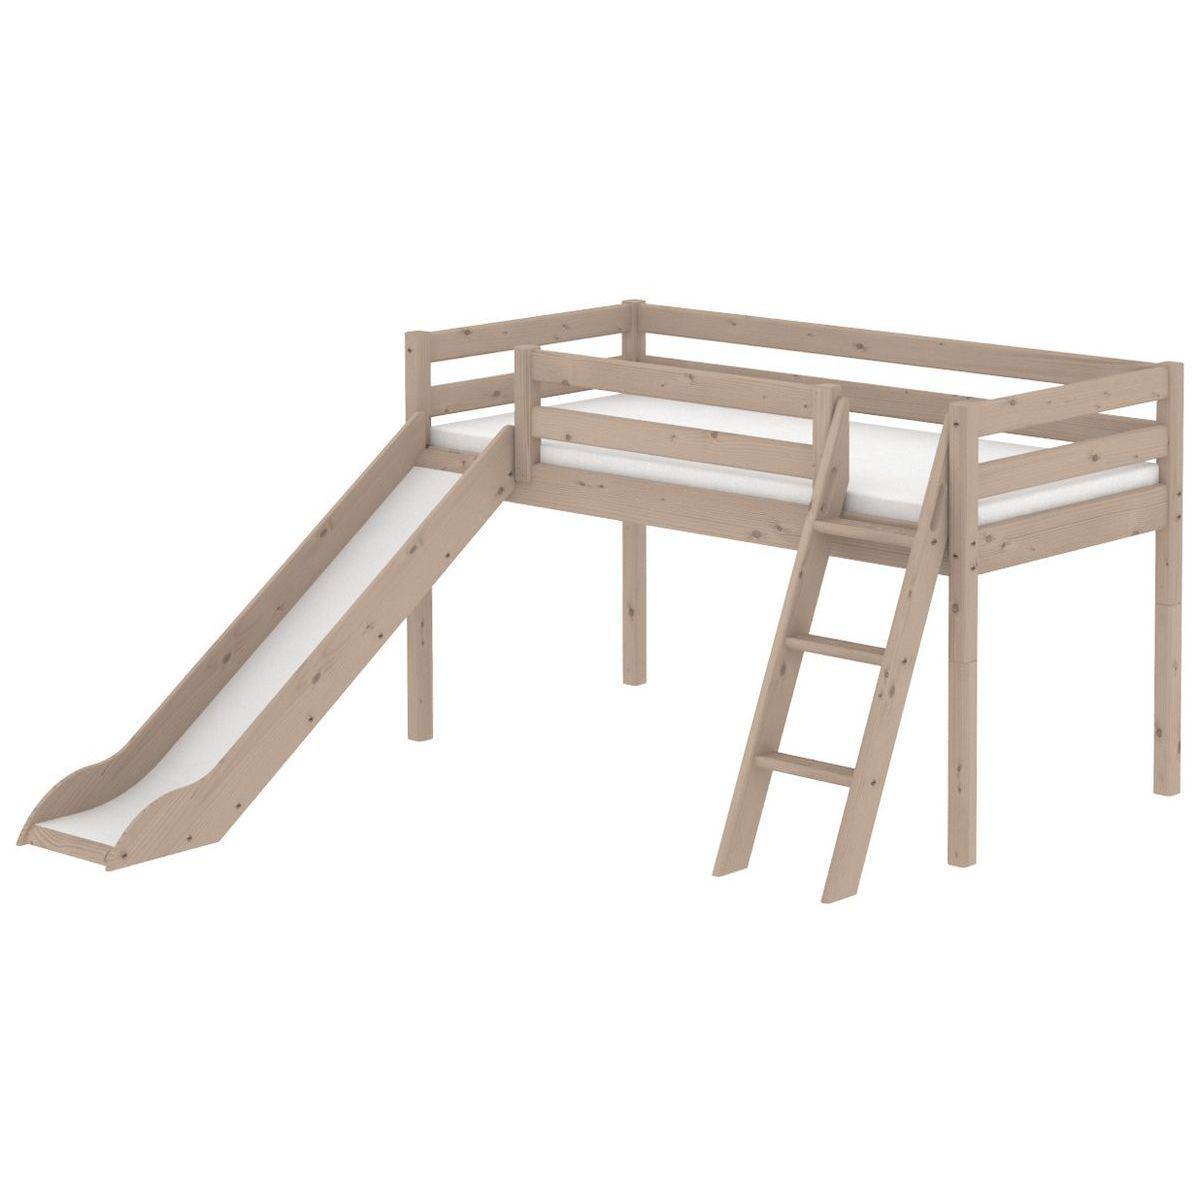 Cama media alta 90x190 CLASSIC Flexa escalera inclinada tobogán terra